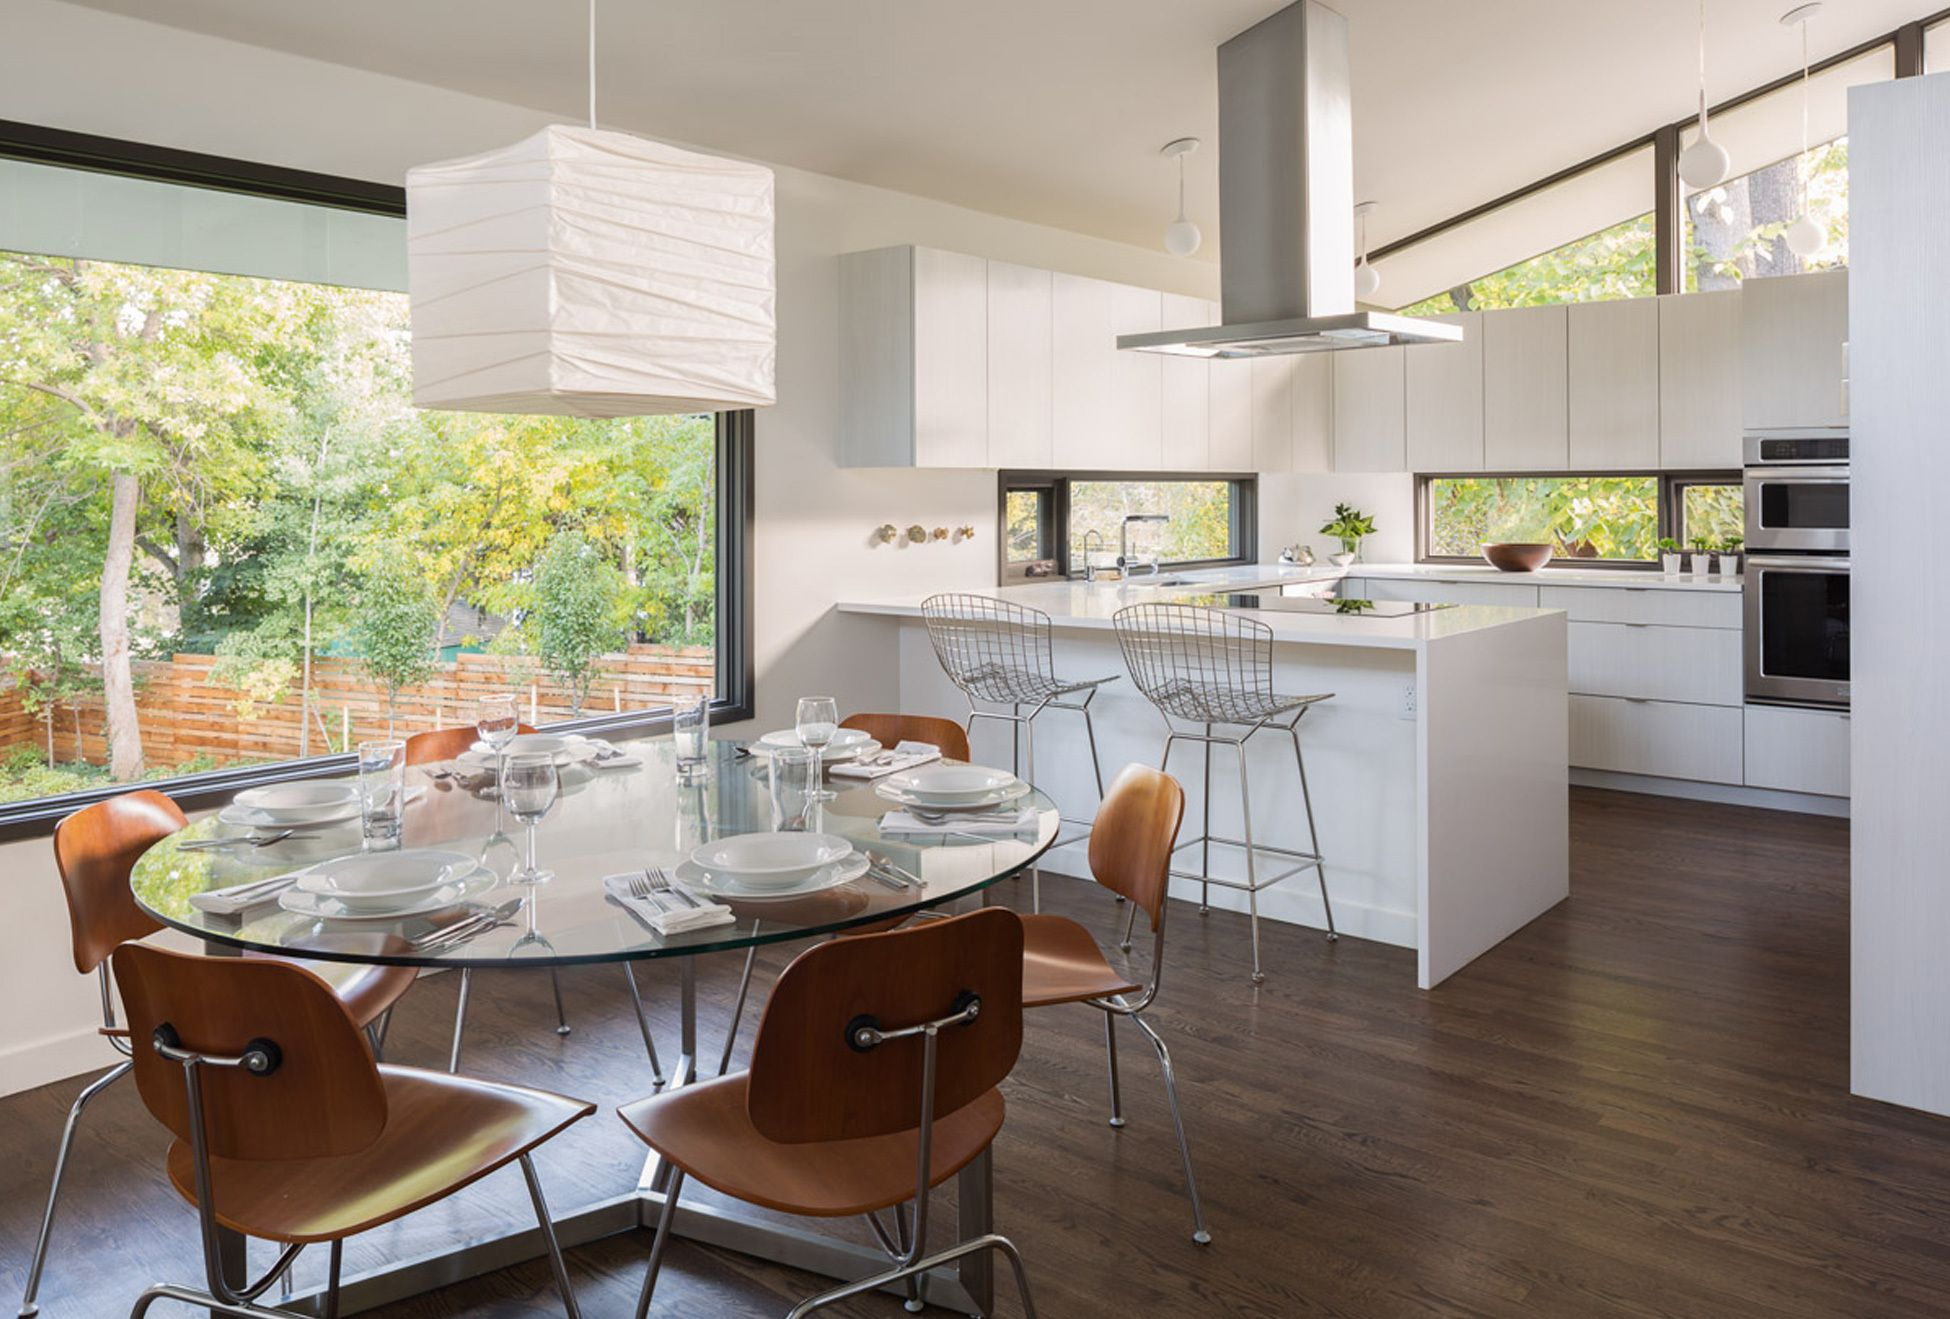 Kitchen with no window  mid century remodern by hmhai  ranges window and storage